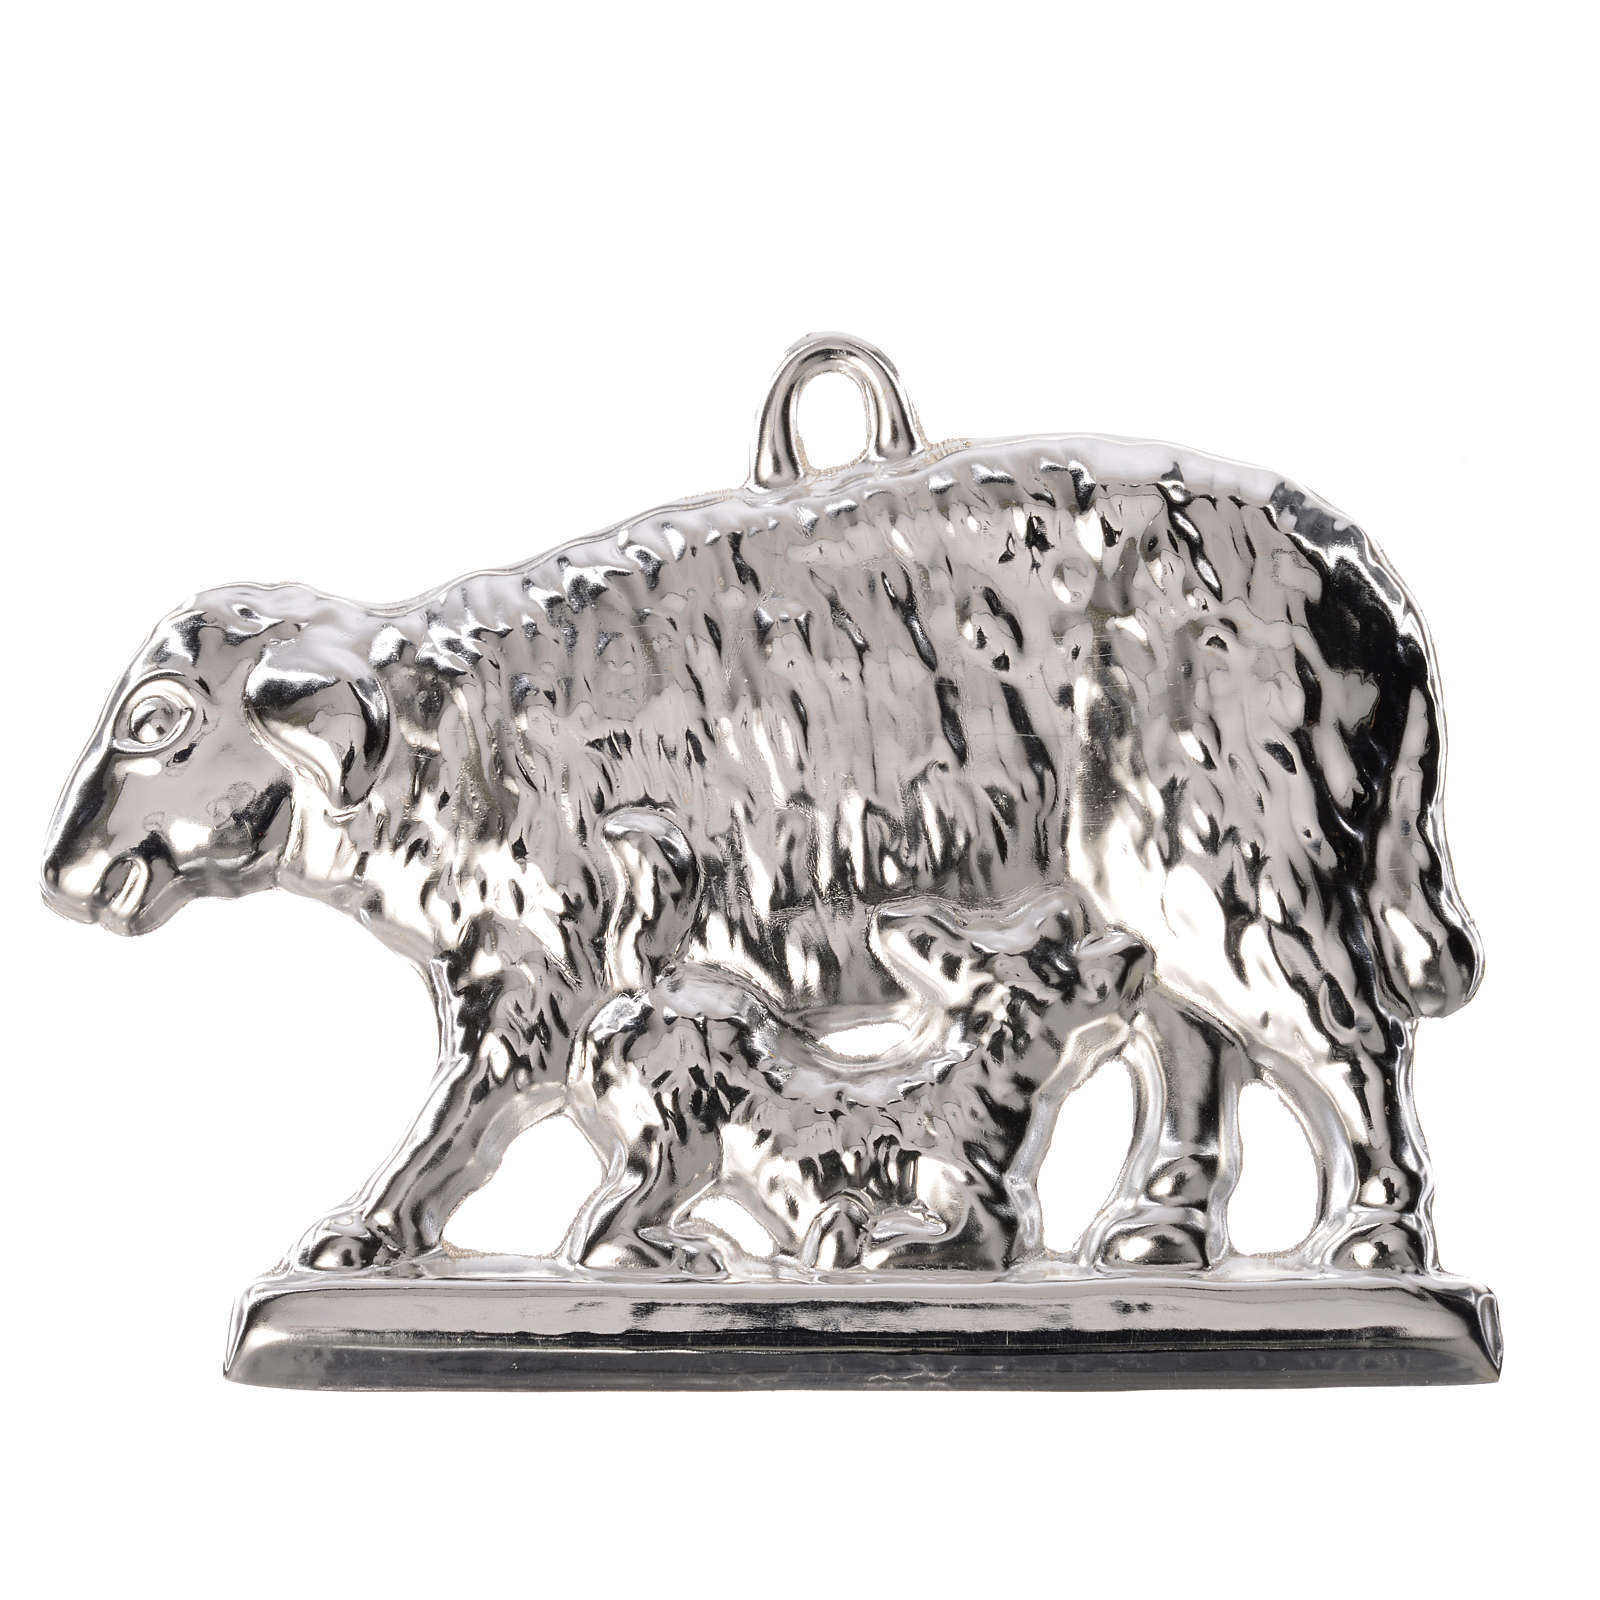 Ex-voto oveja y cordero tendido plata 925 o metal 11 x 7 cm. 3